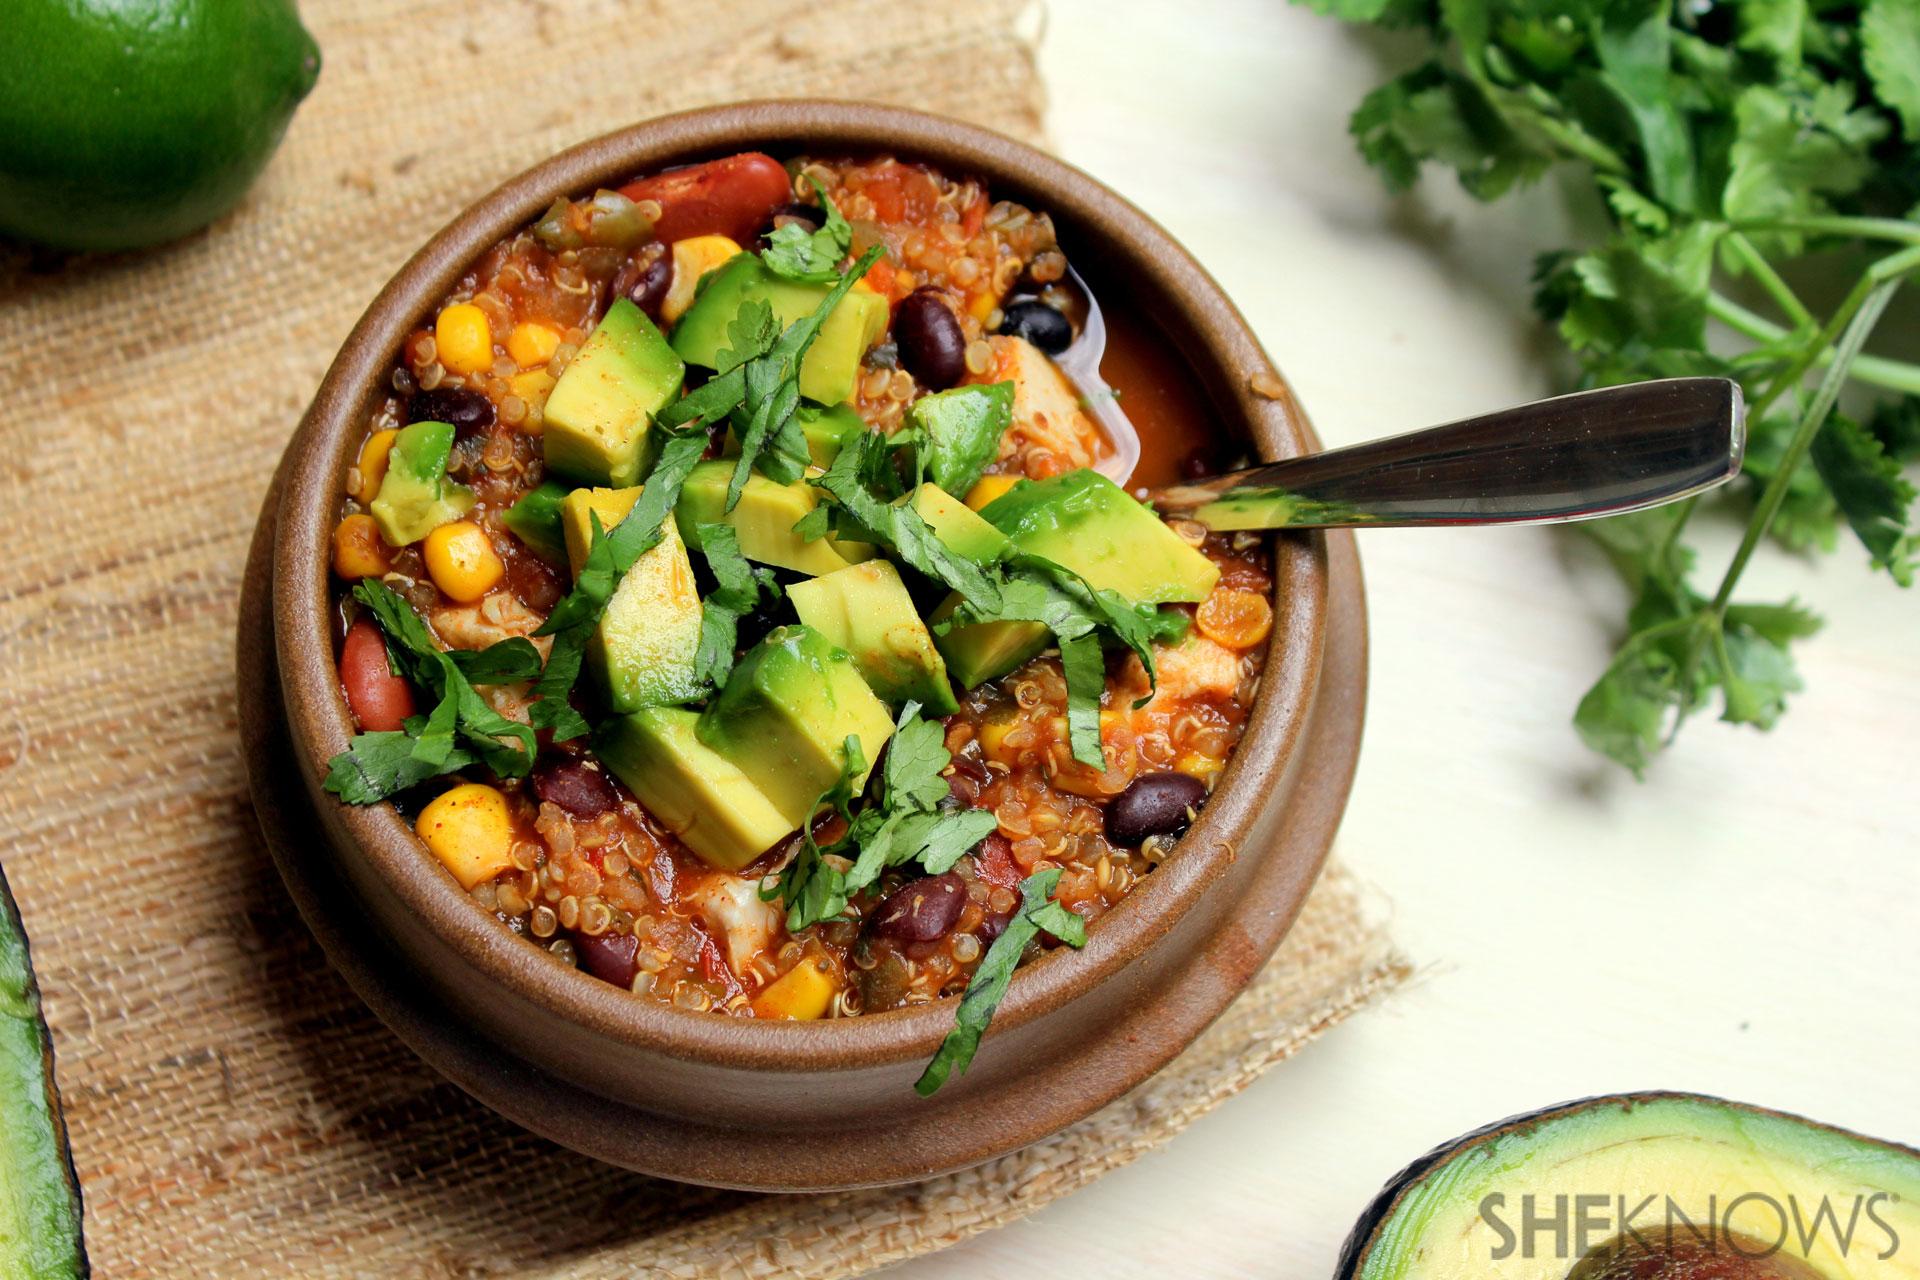 Southwest Quinoa Chili